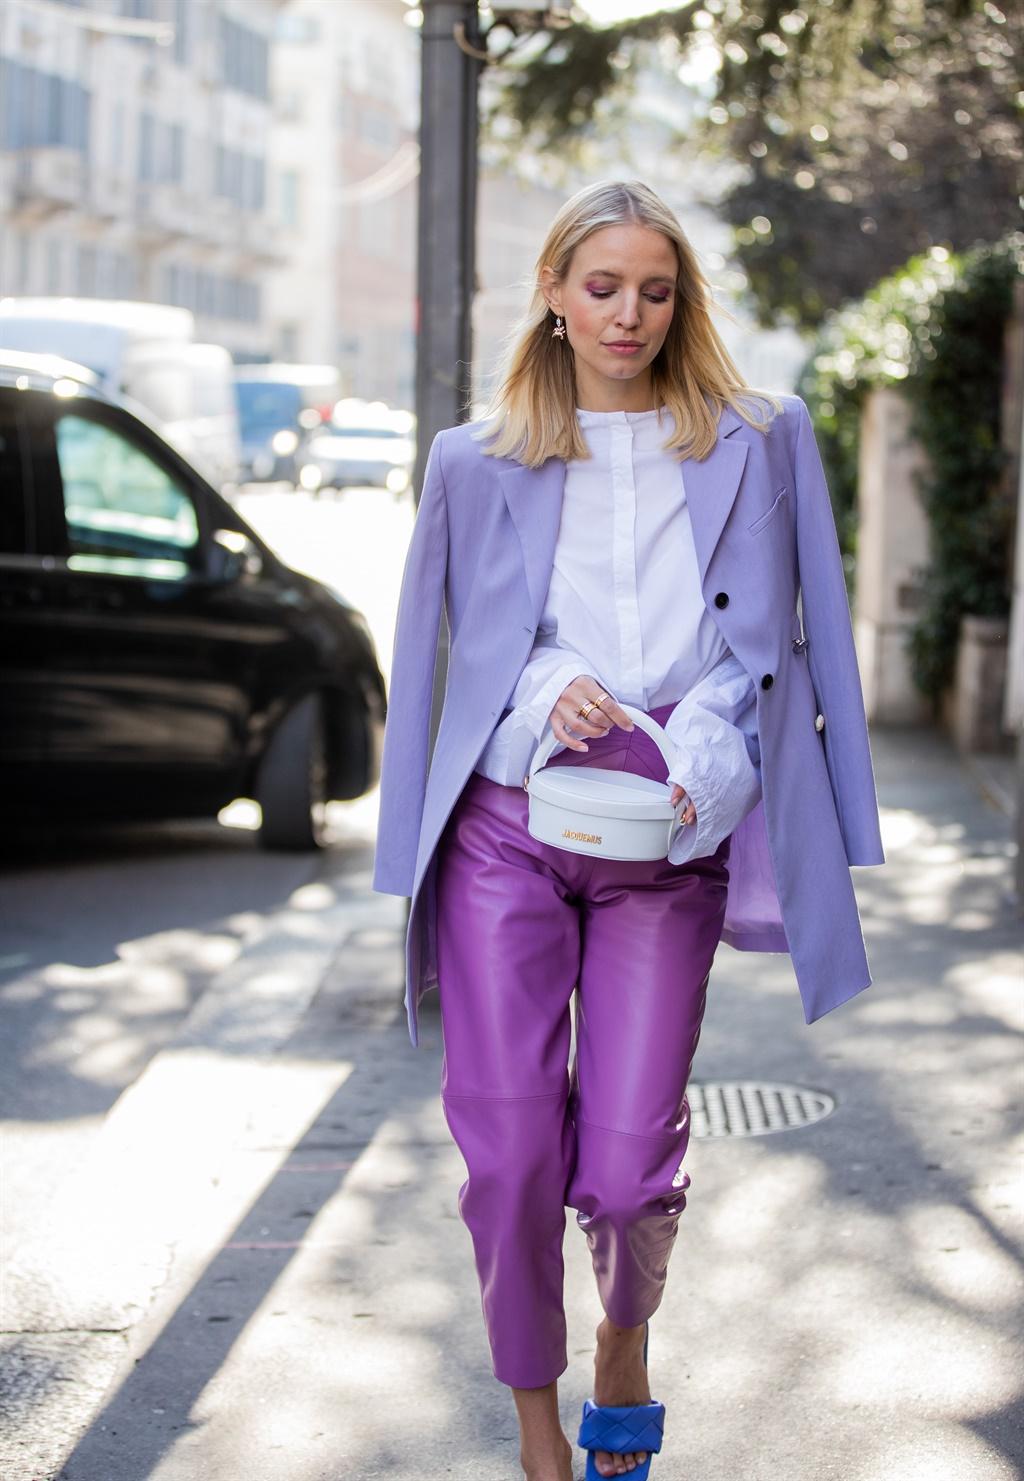 MILAN, ITALY - FEBRUARY 20: Leonie Hanne wearing p